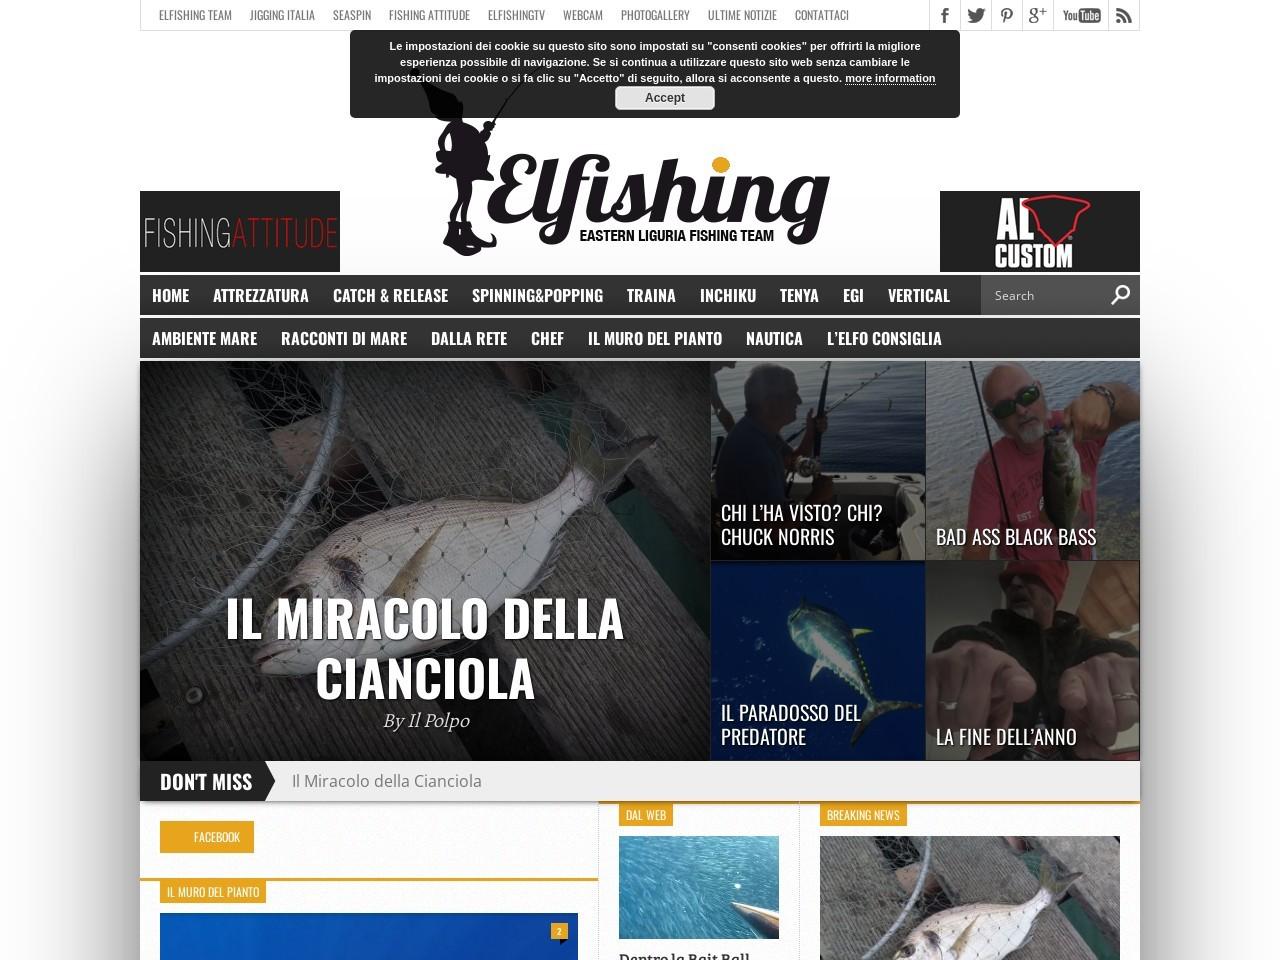 elfishing-estern-liguria-fishing